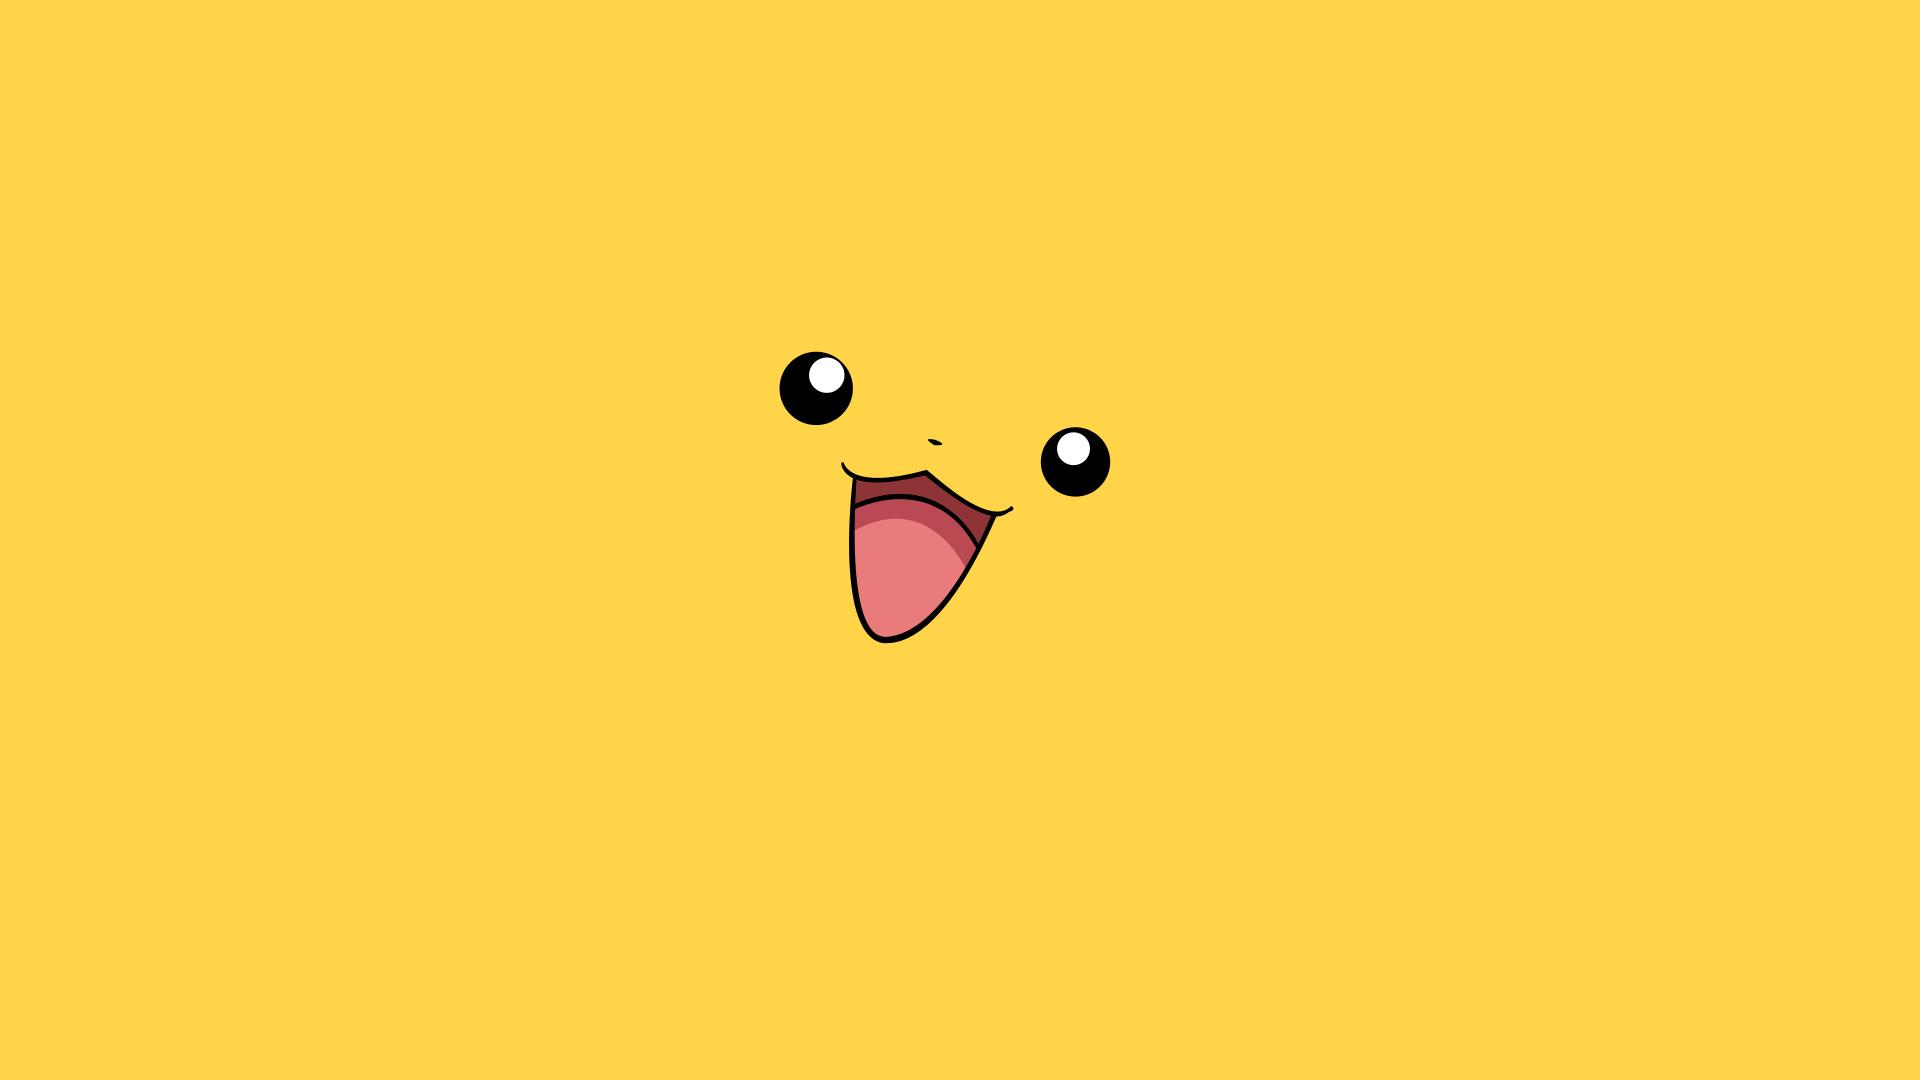 Pikachu Backgrounds - Wallpaper Cave